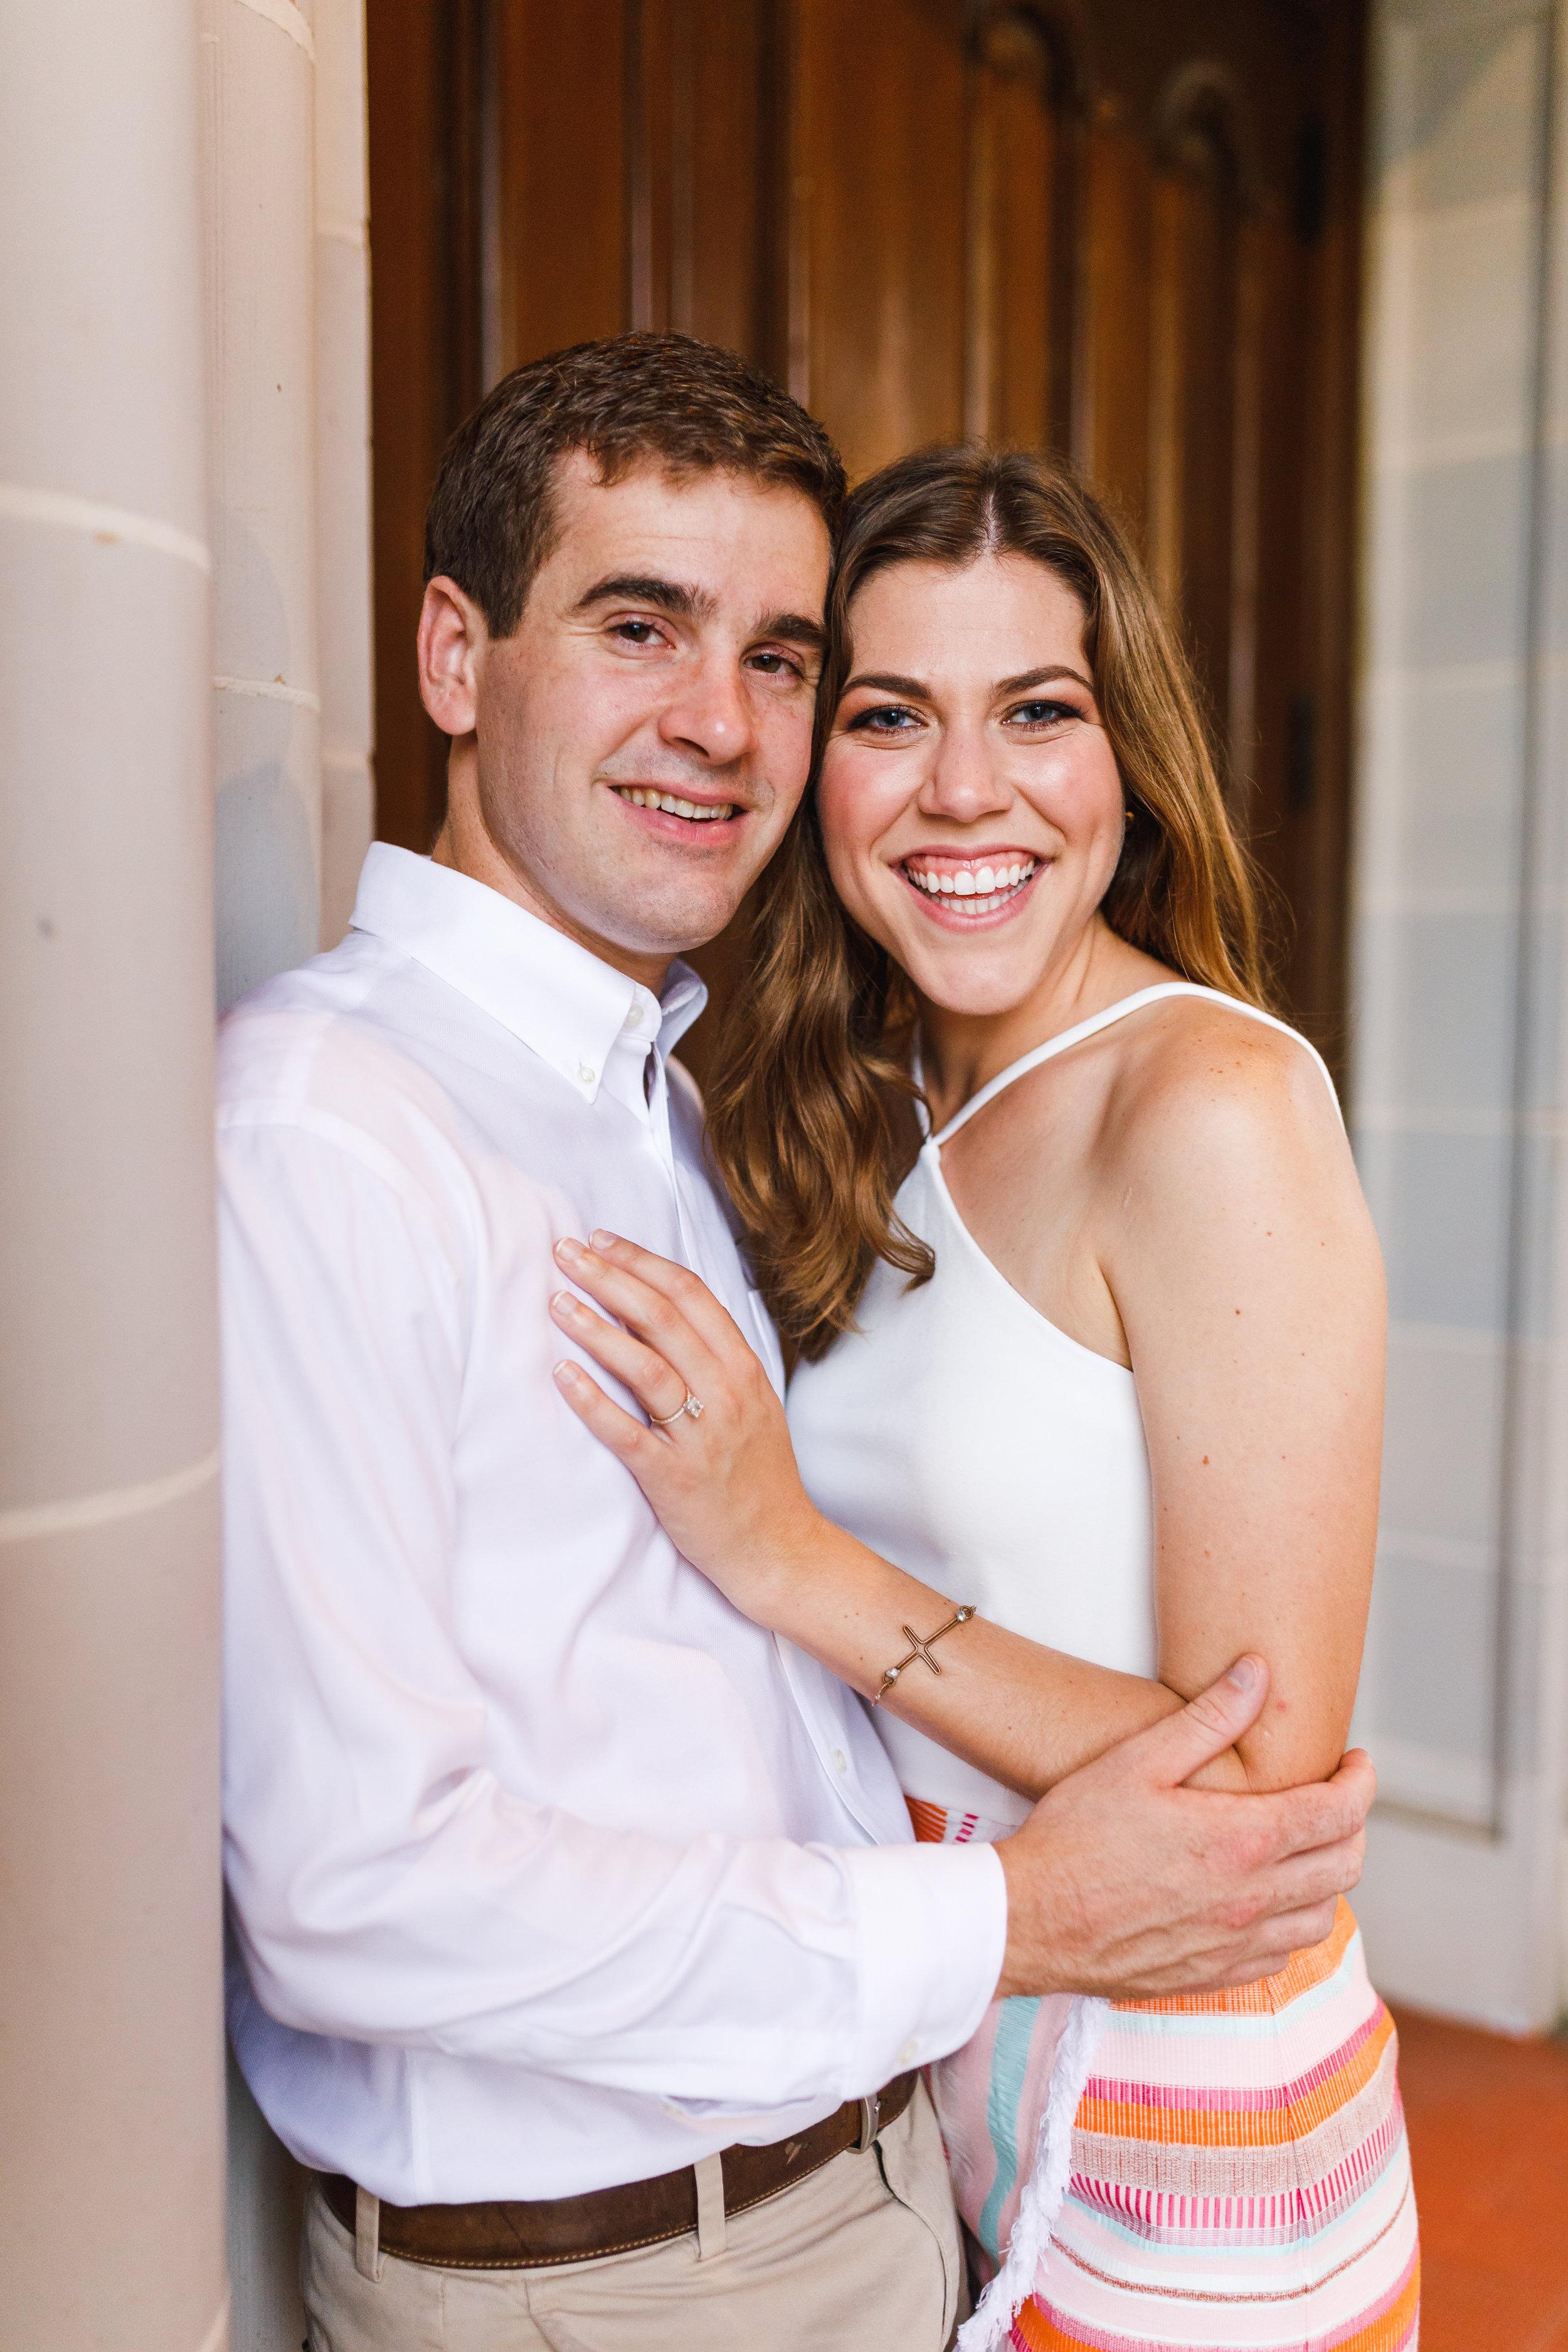 Youngsville-lafayette-portrait-family-wedding-photographer-7709.jpg